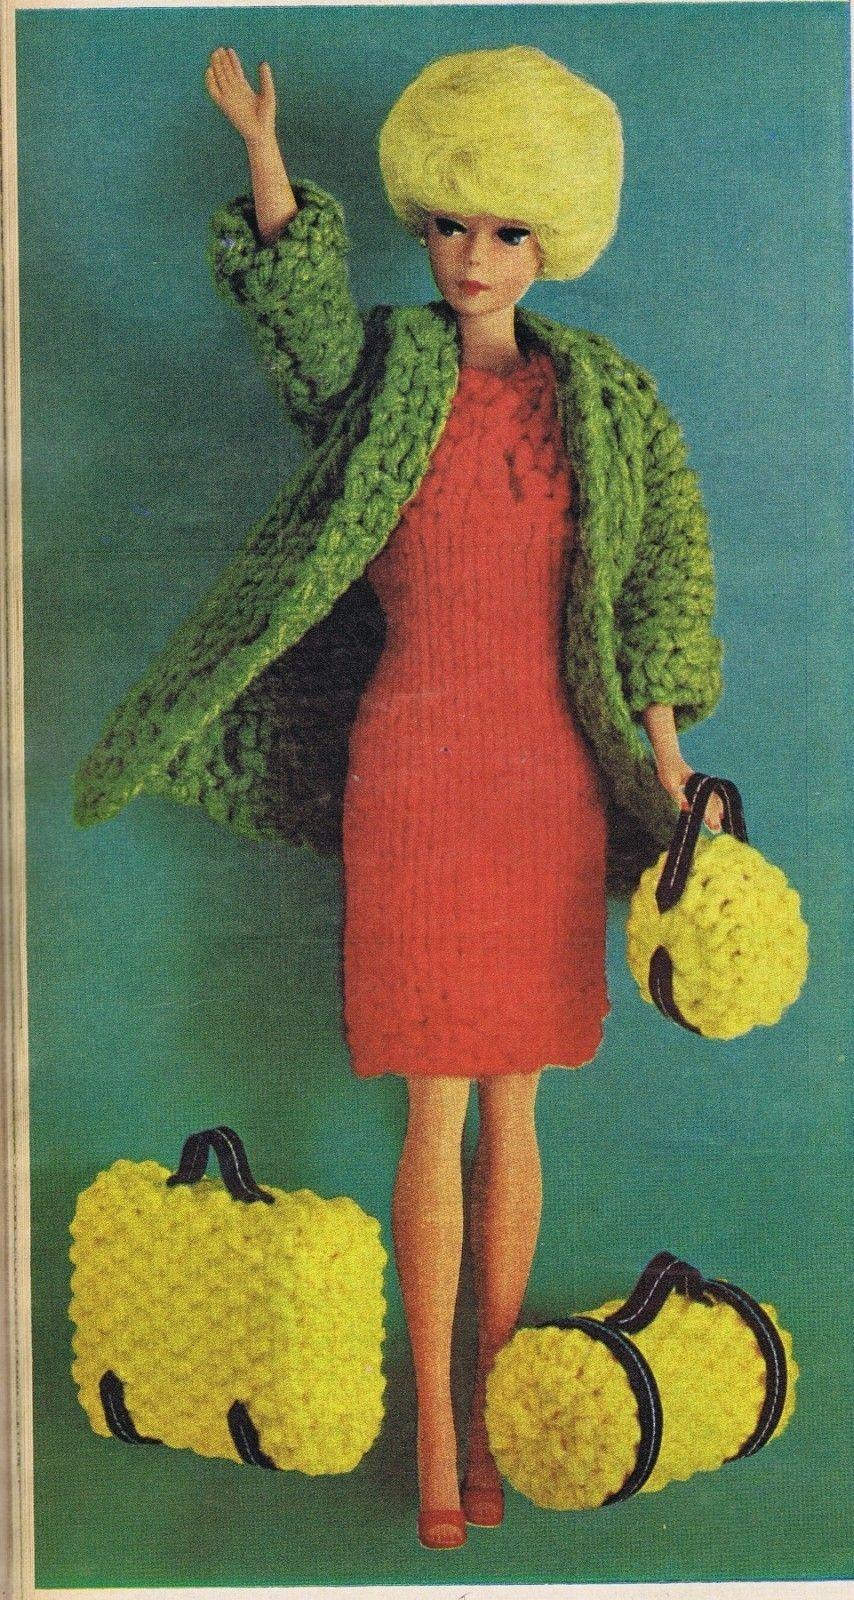 VINTAGE KNITTING CROCHET PATTERNS 1960s RIBBON DRESS BLOUSE FASHION DOLL CLOTHES | eBay